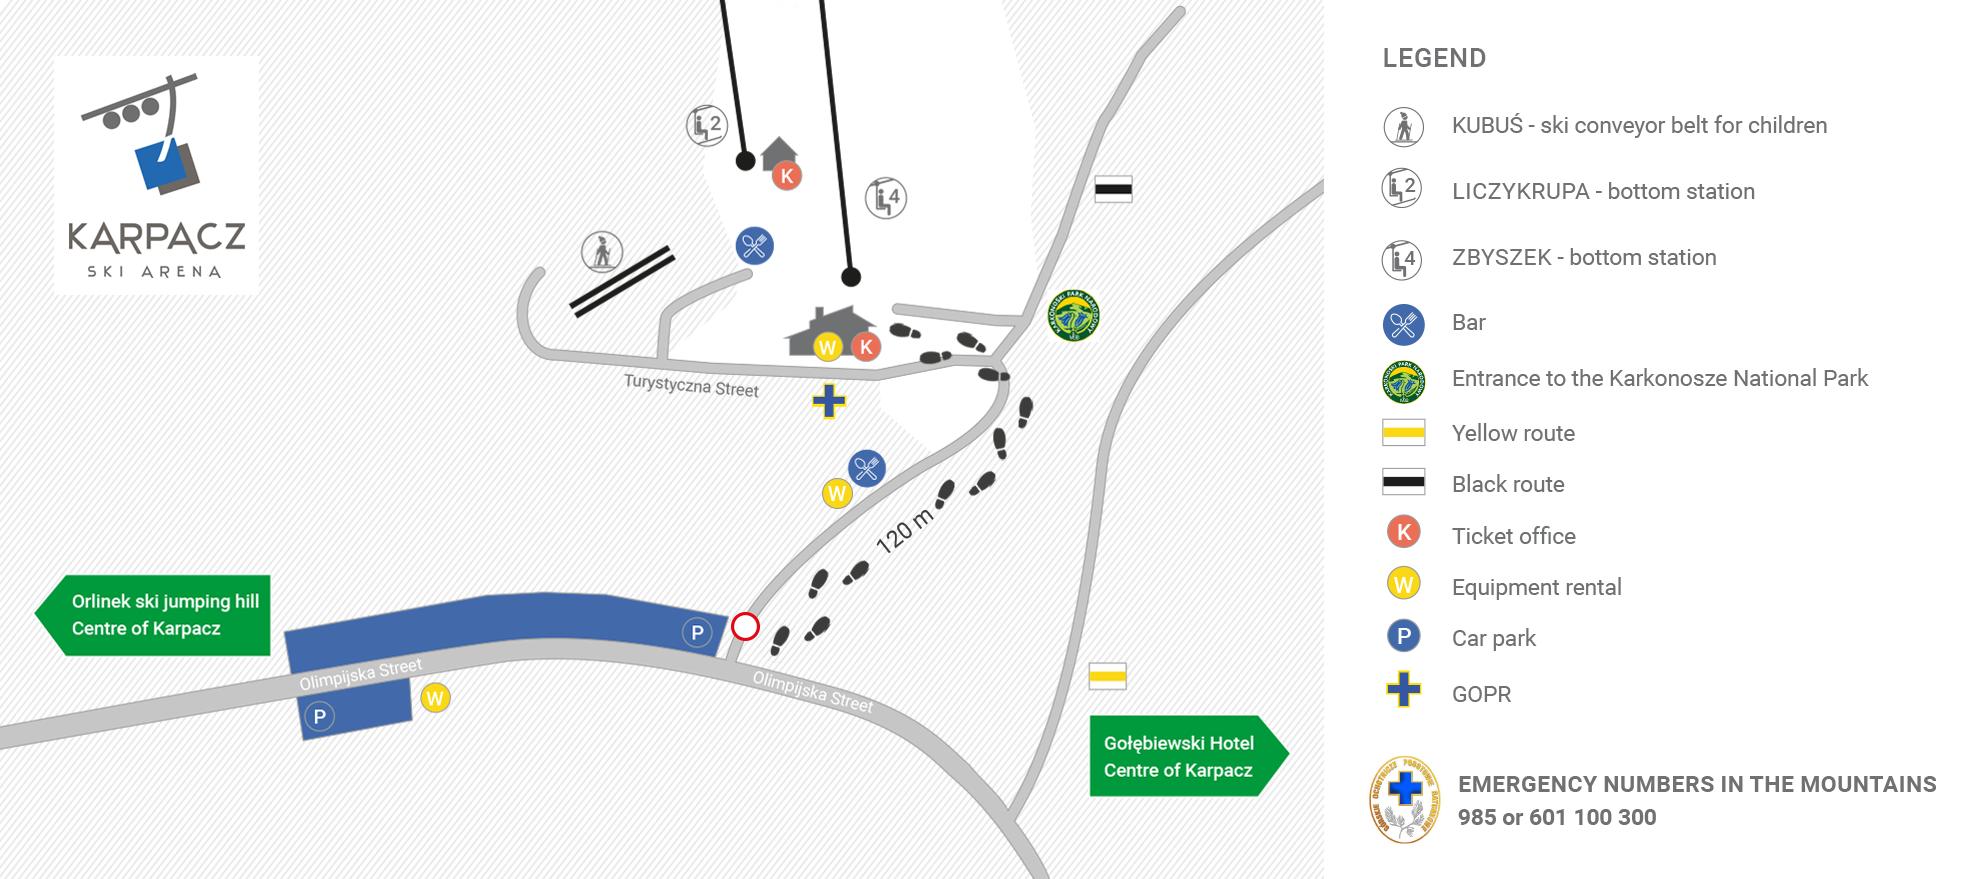 Karpacz Ski Arena_Car park and access